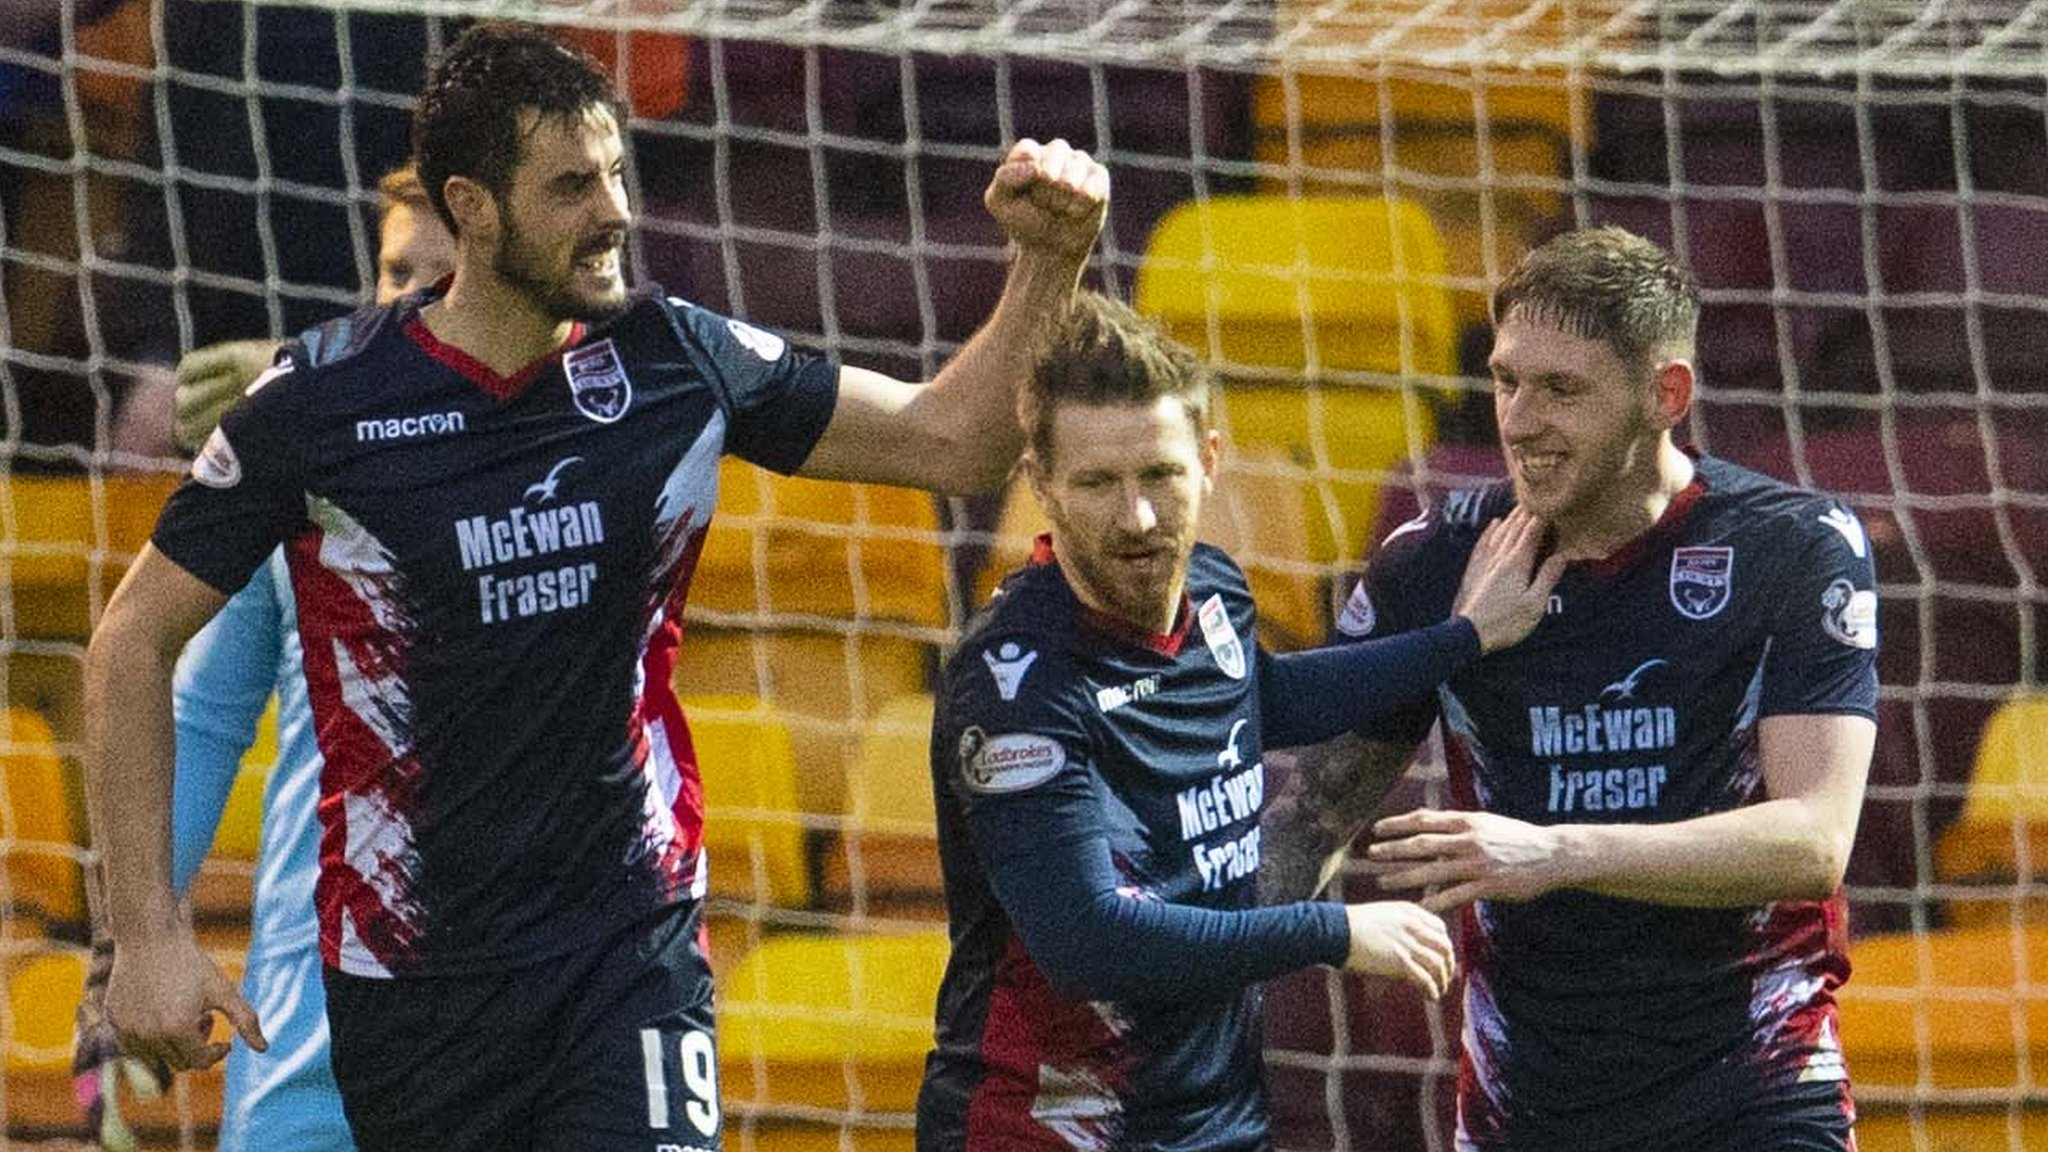 Motherwell 1-2 Ross County: Championship leaders stun Premiership side